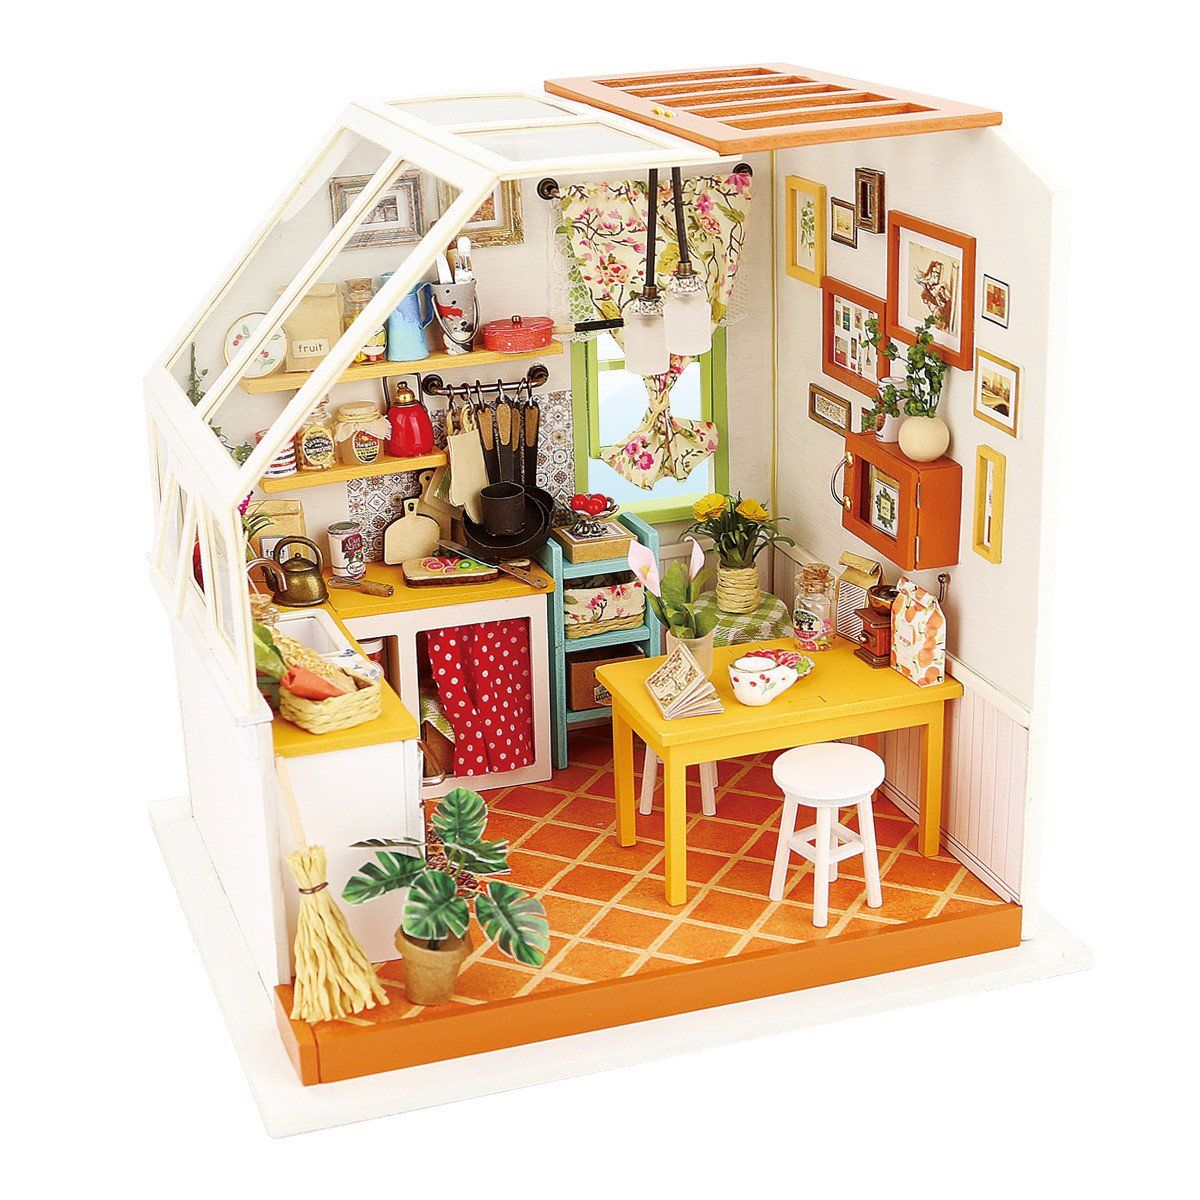 Jason's Kitchen Robotime DIY Miniature Dollhouse Kit